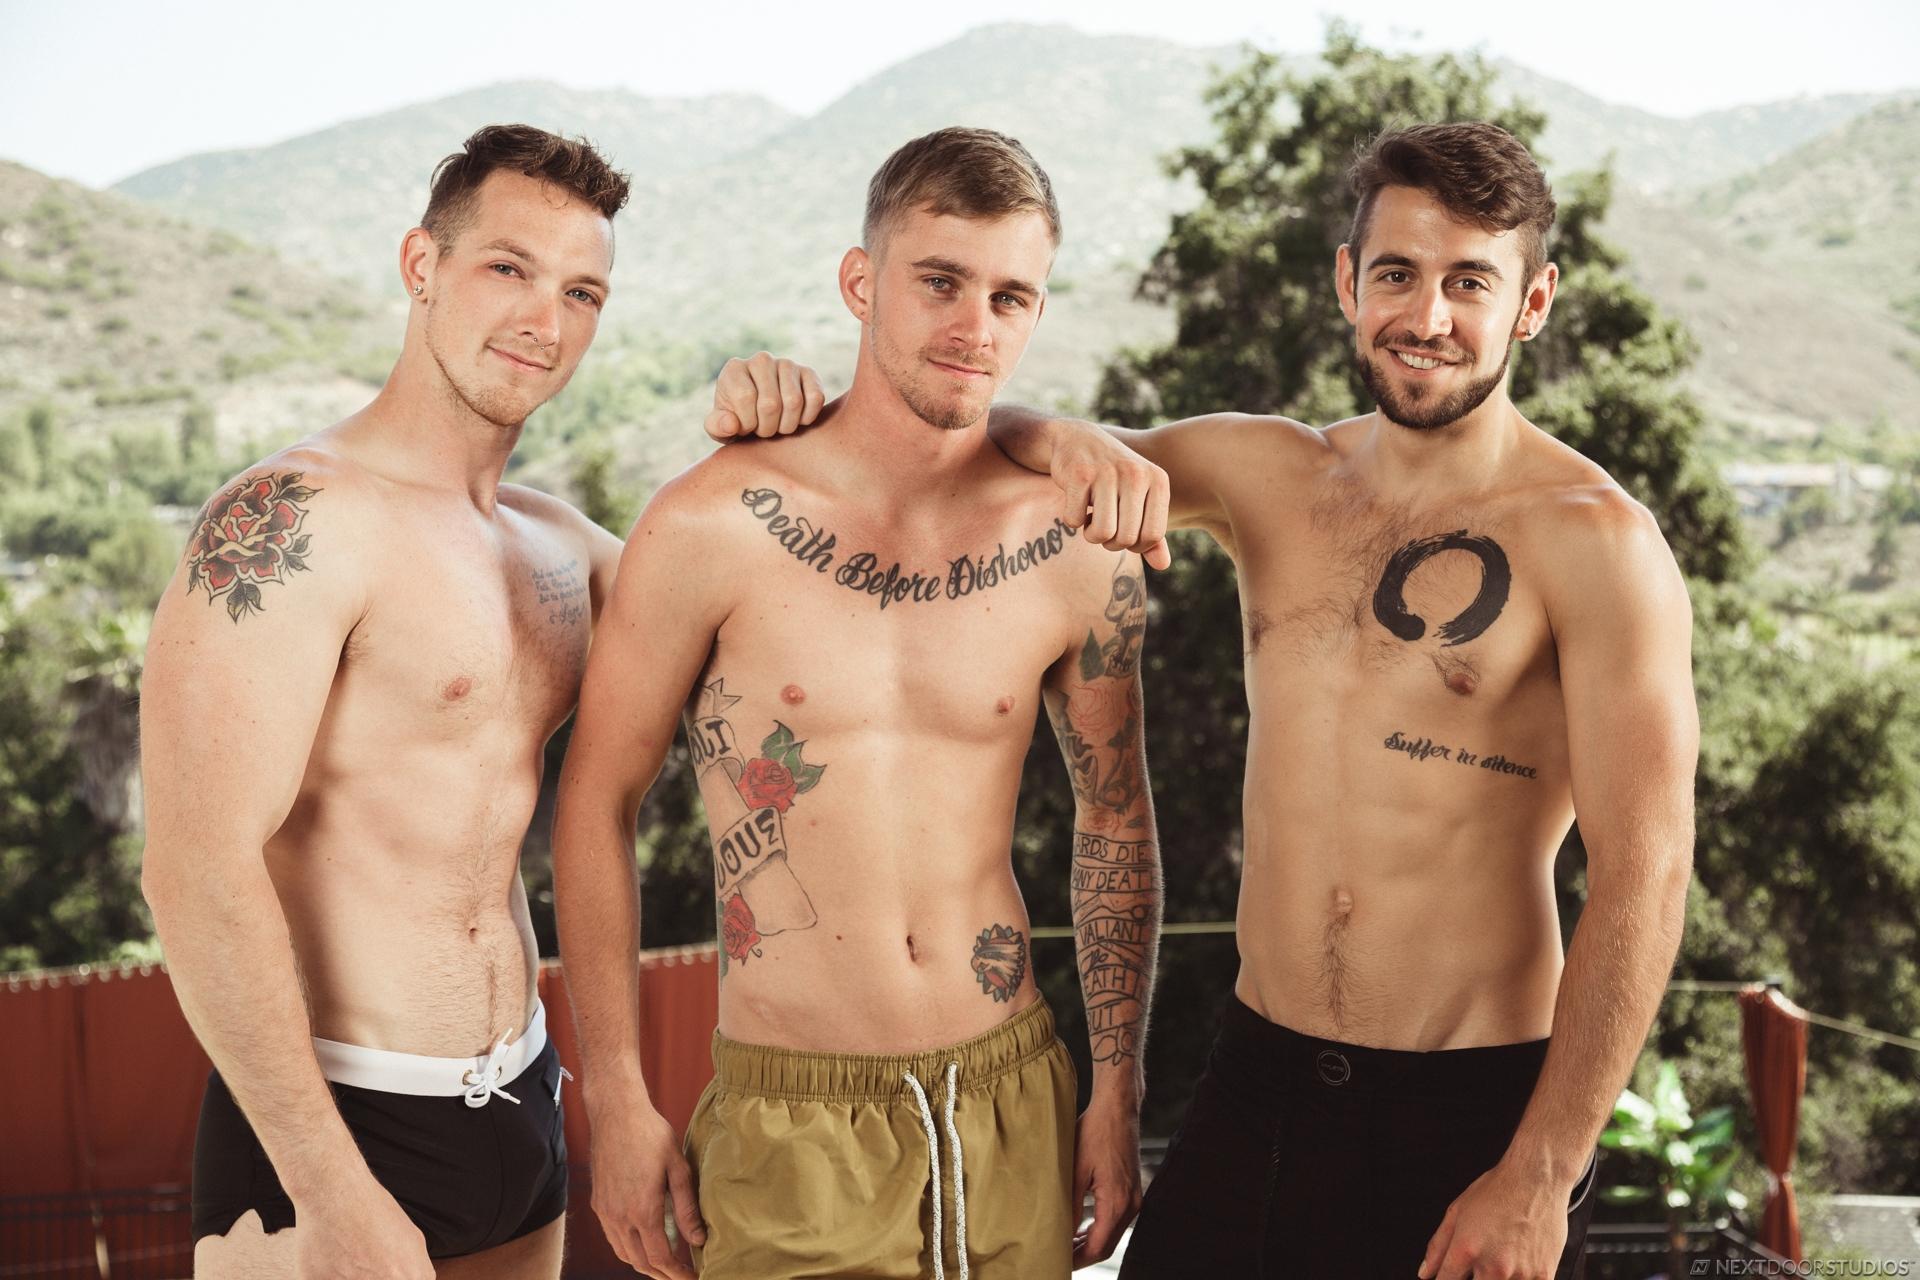 dante colle gay porn next door ryan jordan